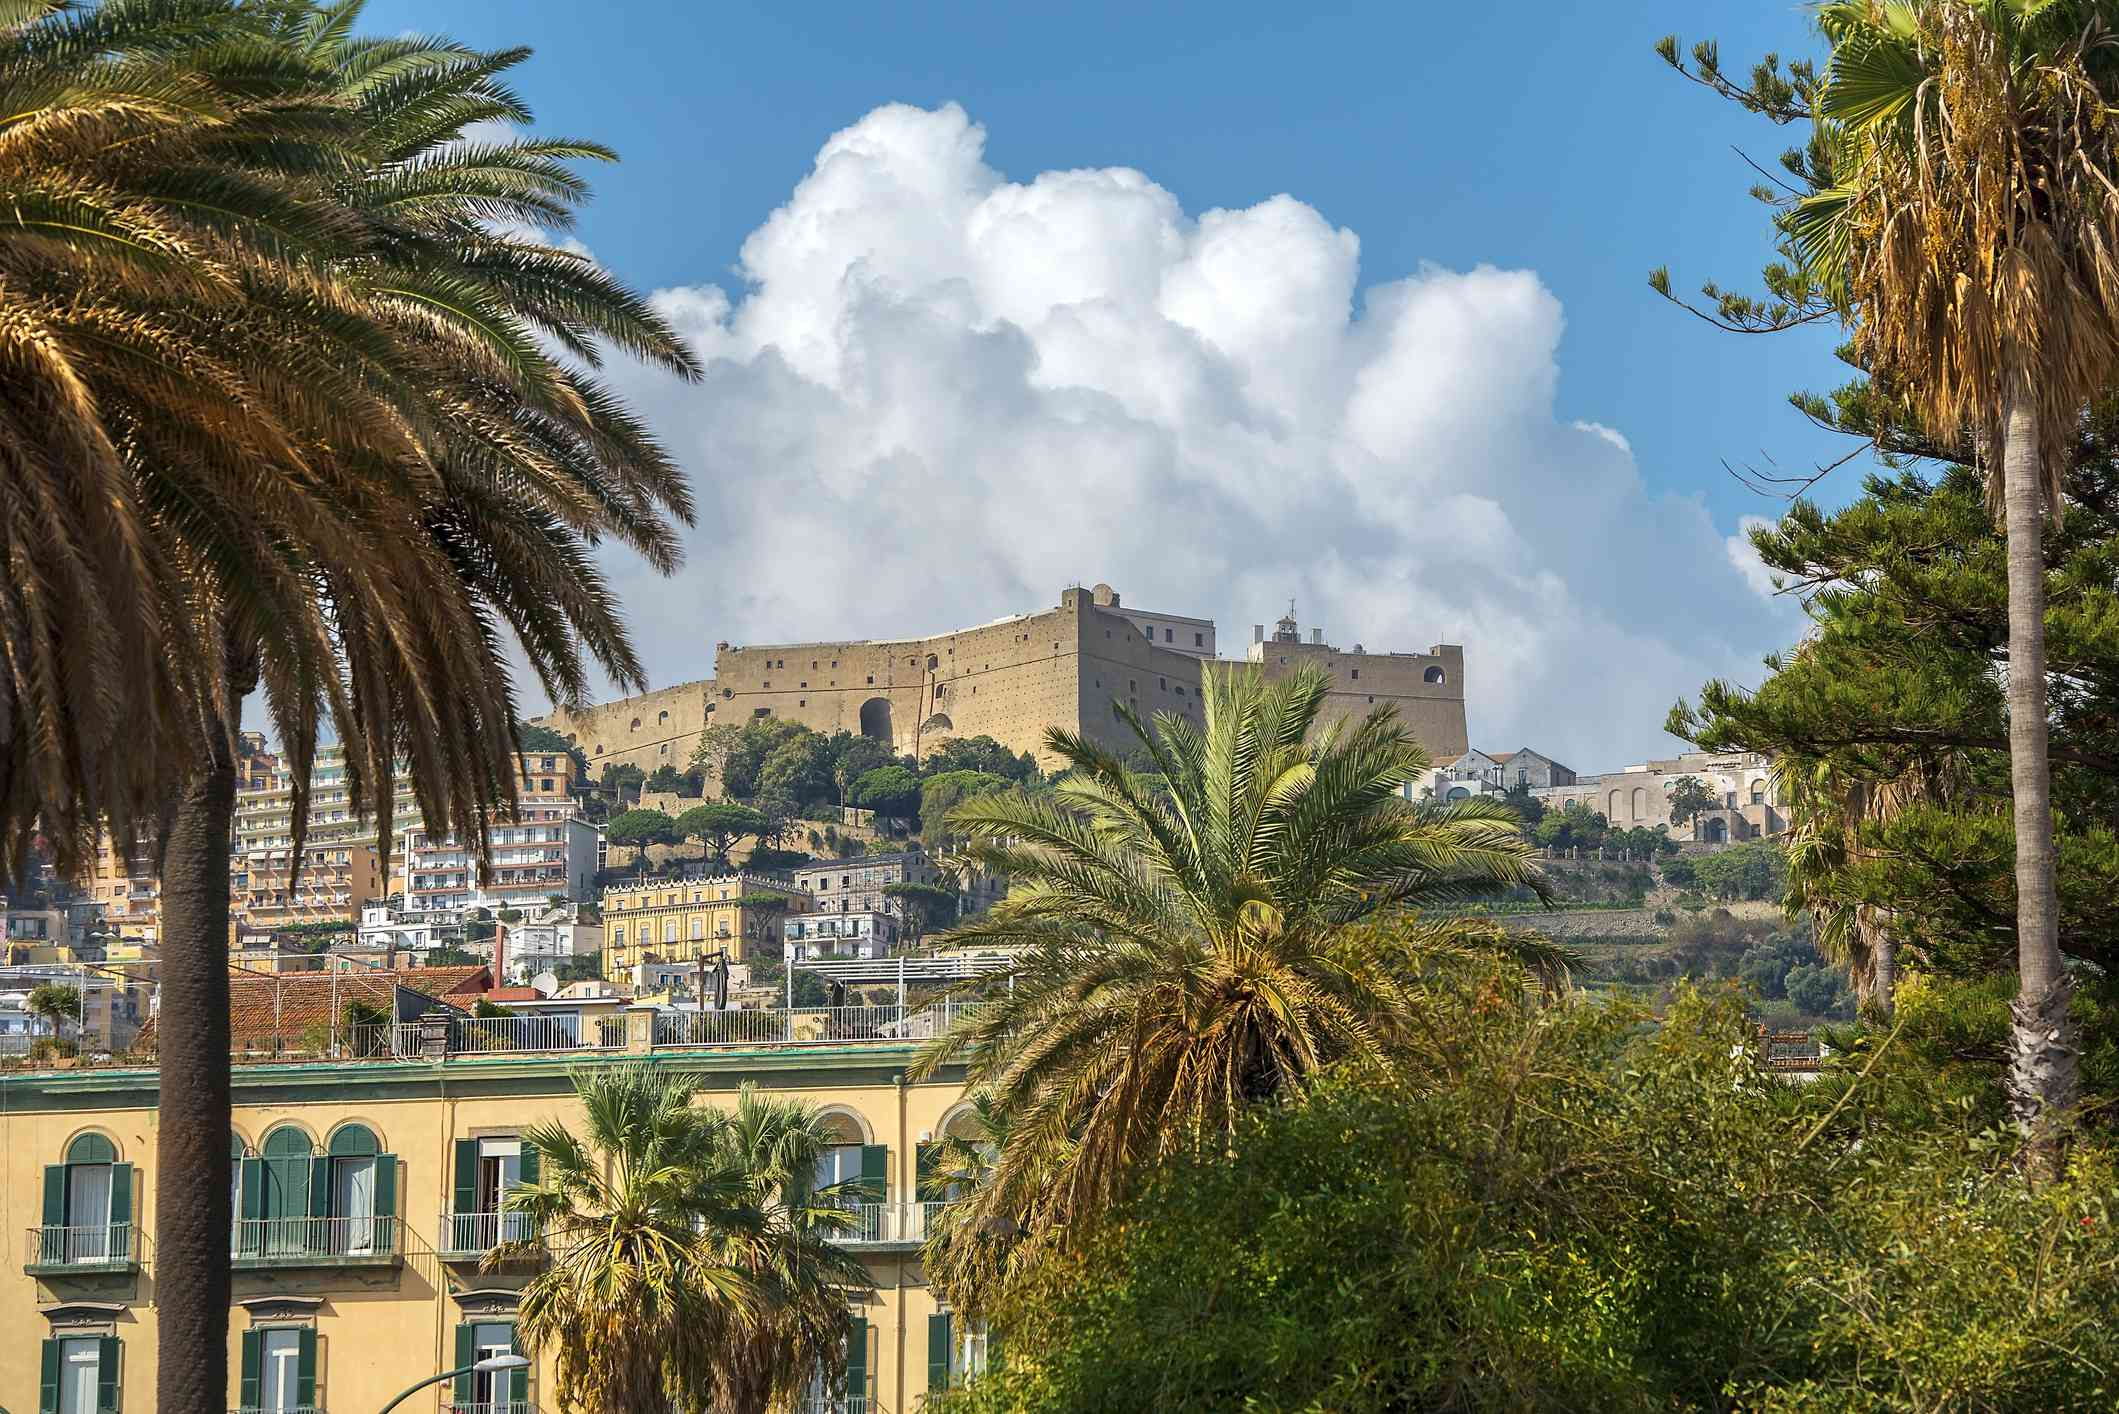 Hilltop Castel Sant'Elmo